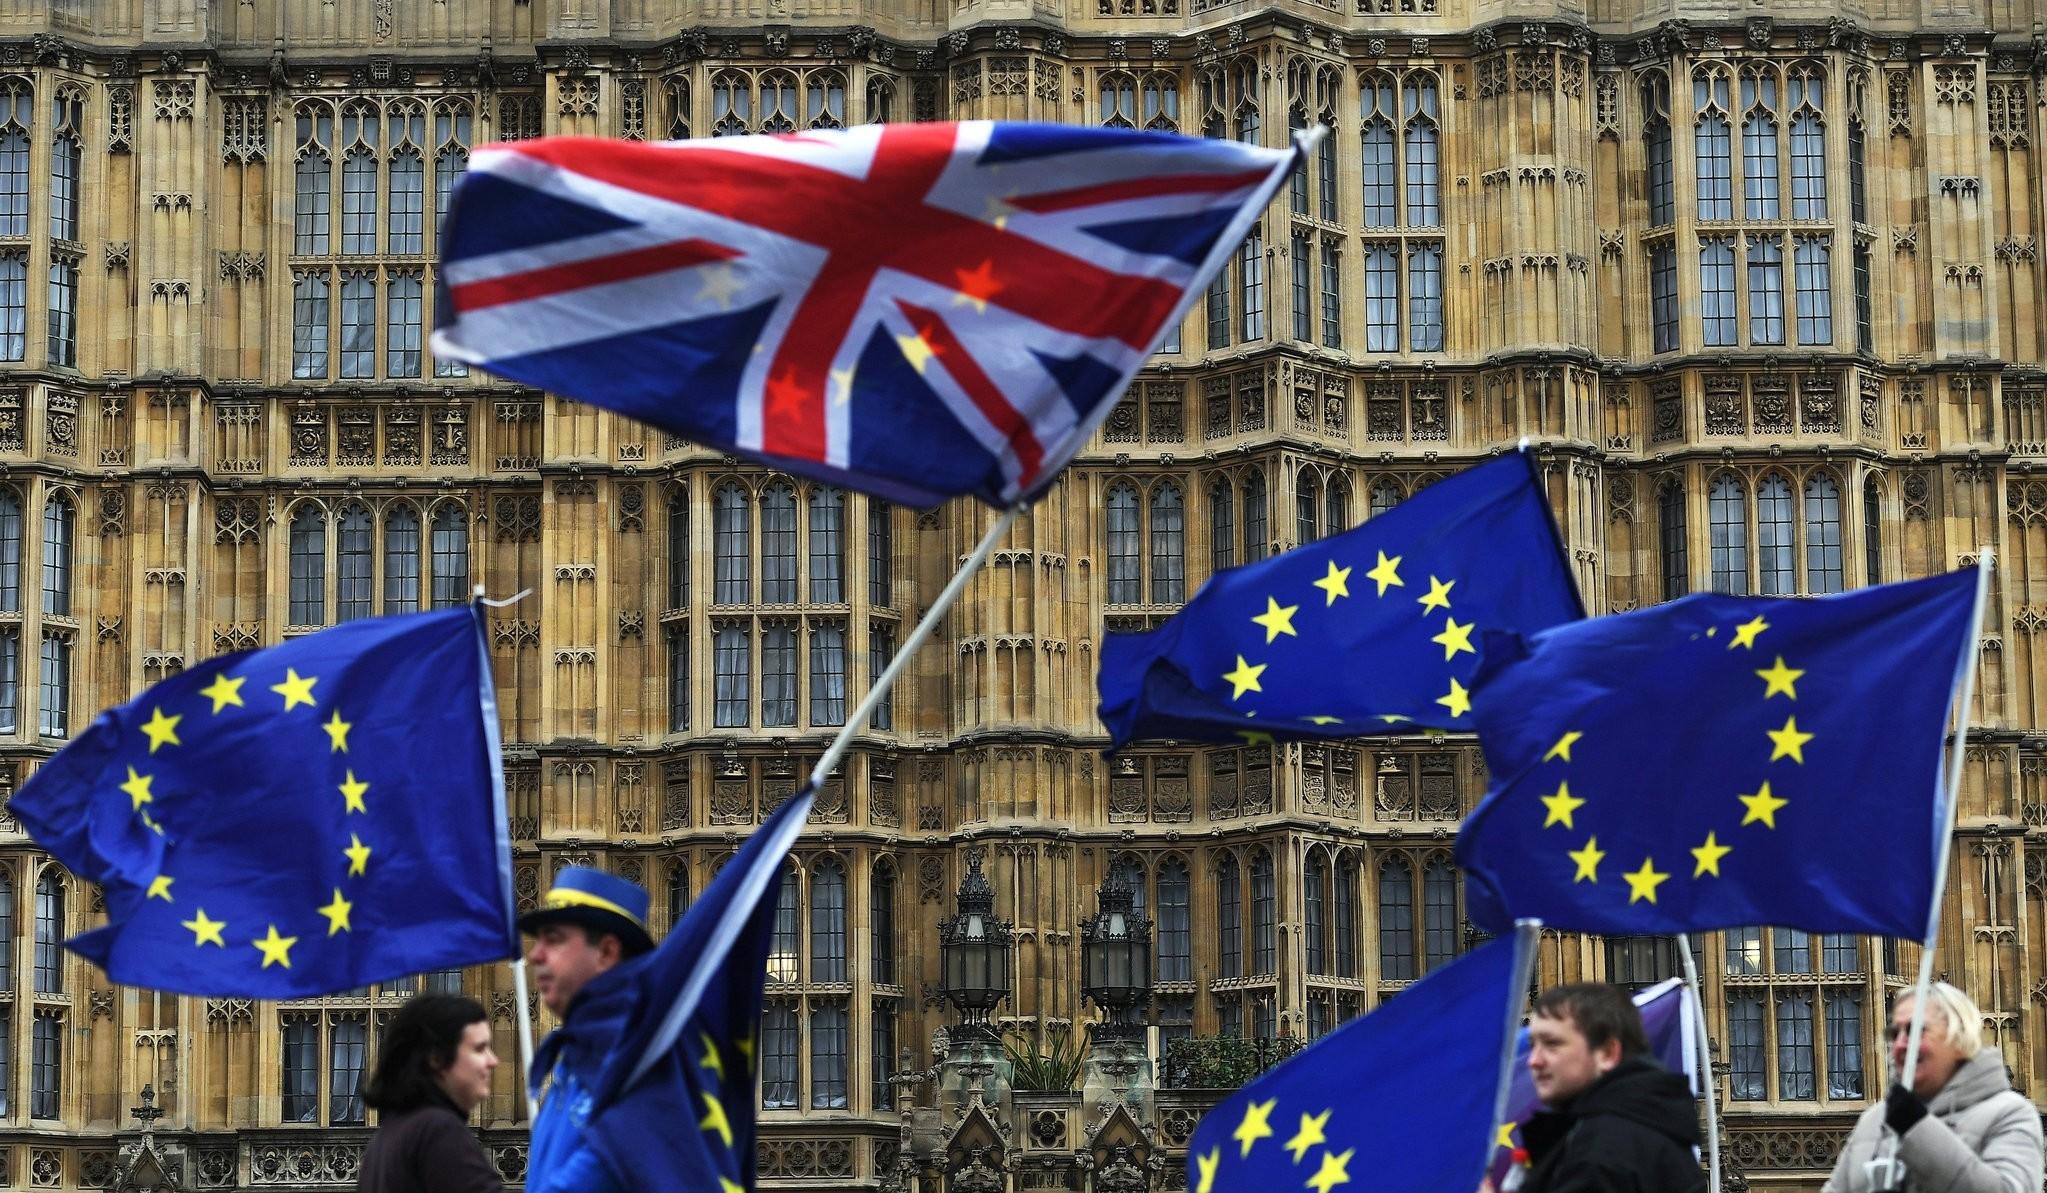 Pro EU campaigners protest outside parliament in London, Britain, January 29, 2018. (EPA Photo)